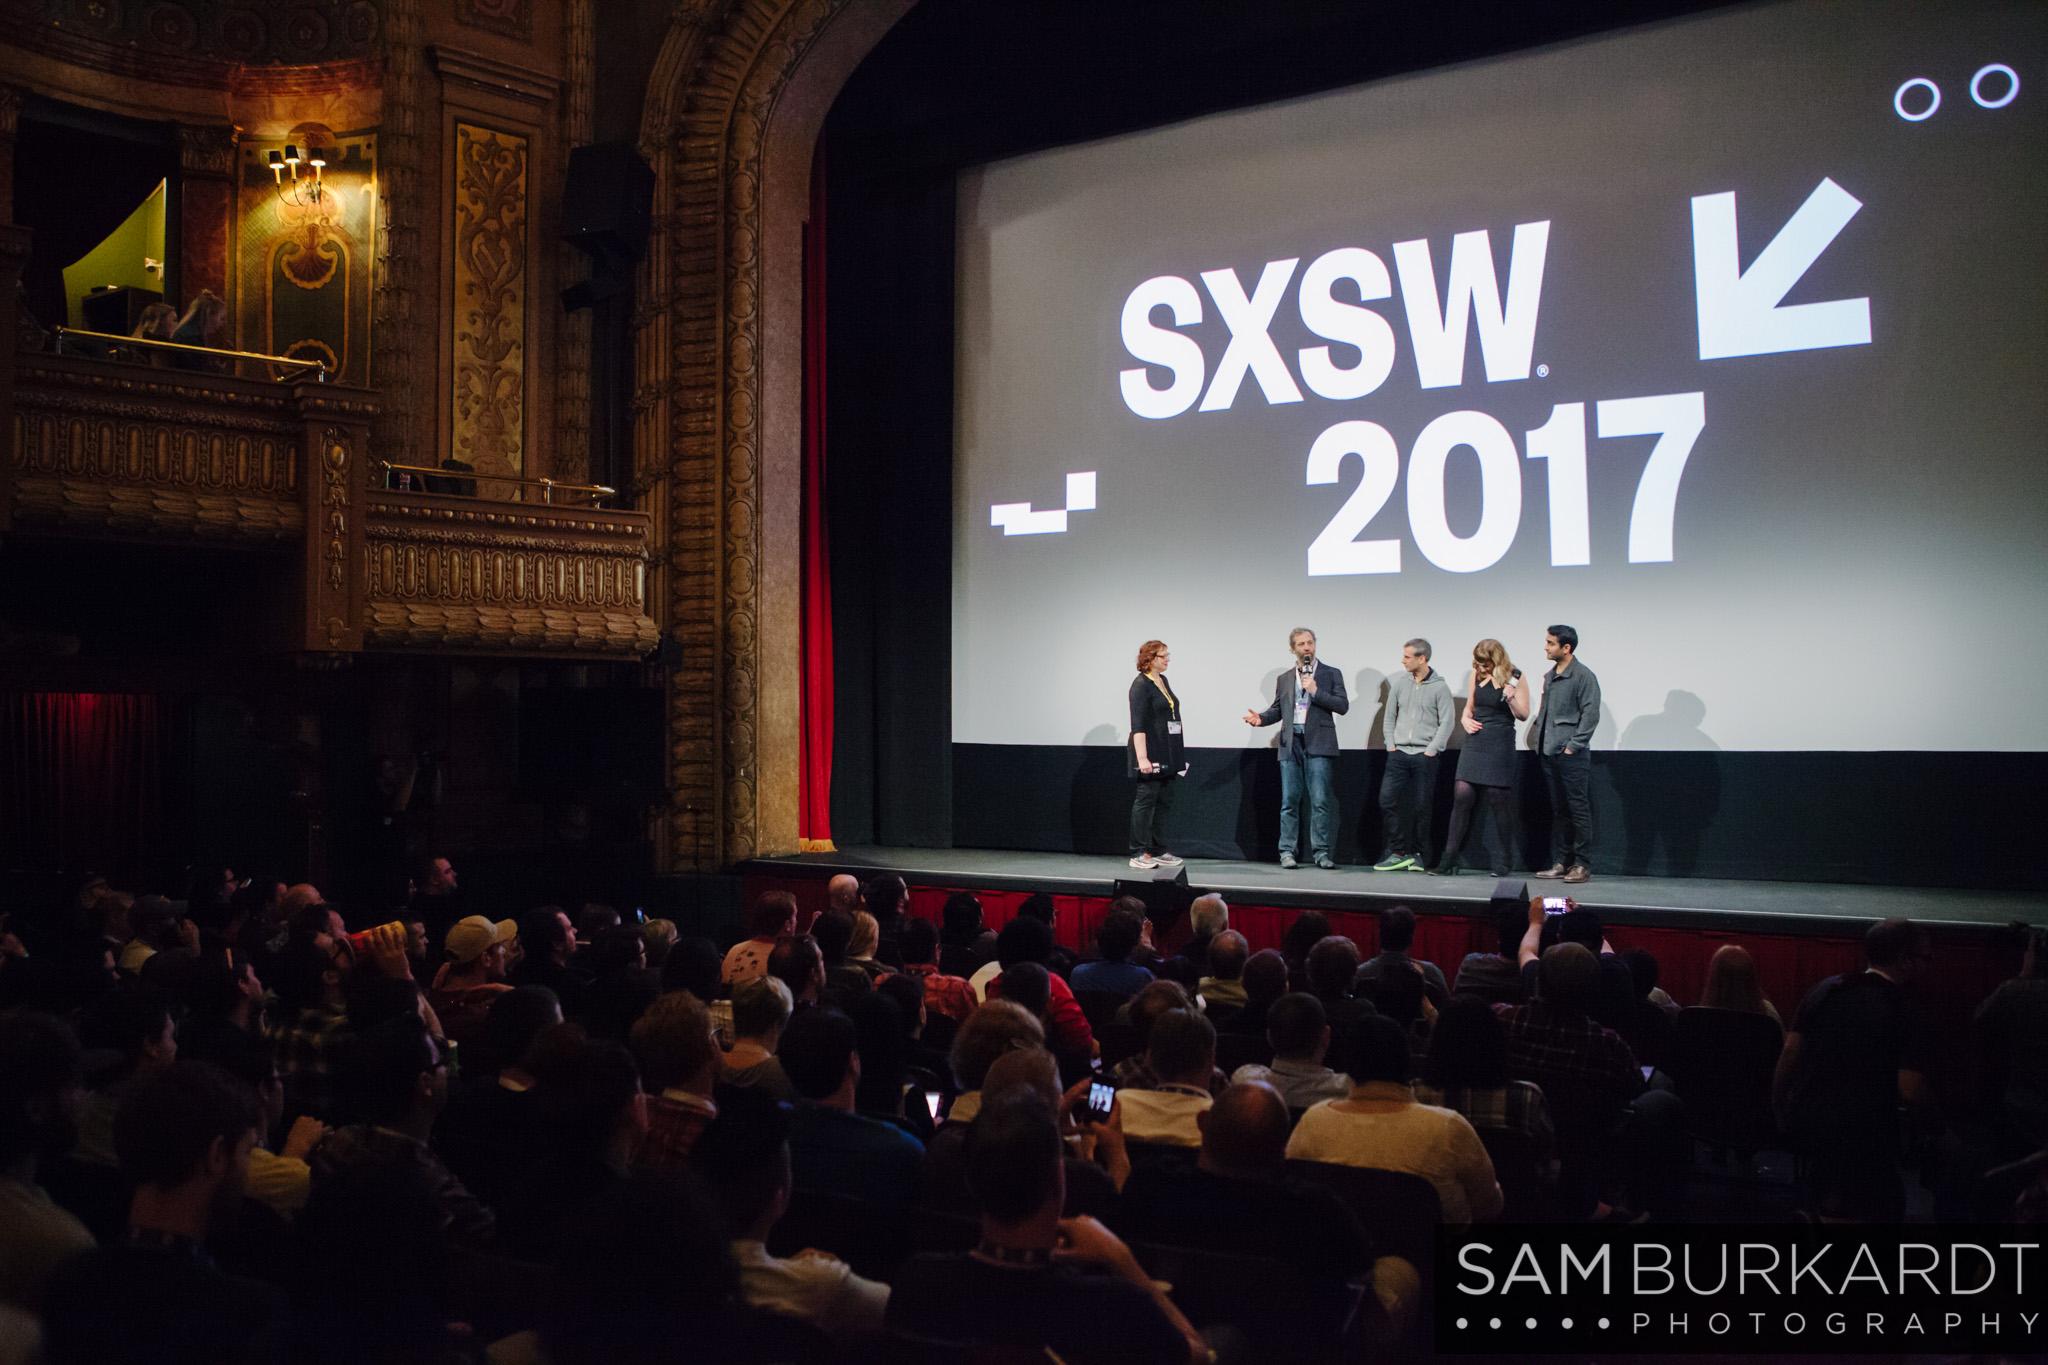 Judd Apatow, Emily V. Gordon, Kumali Nanjiani - The Big Sick movie premiere